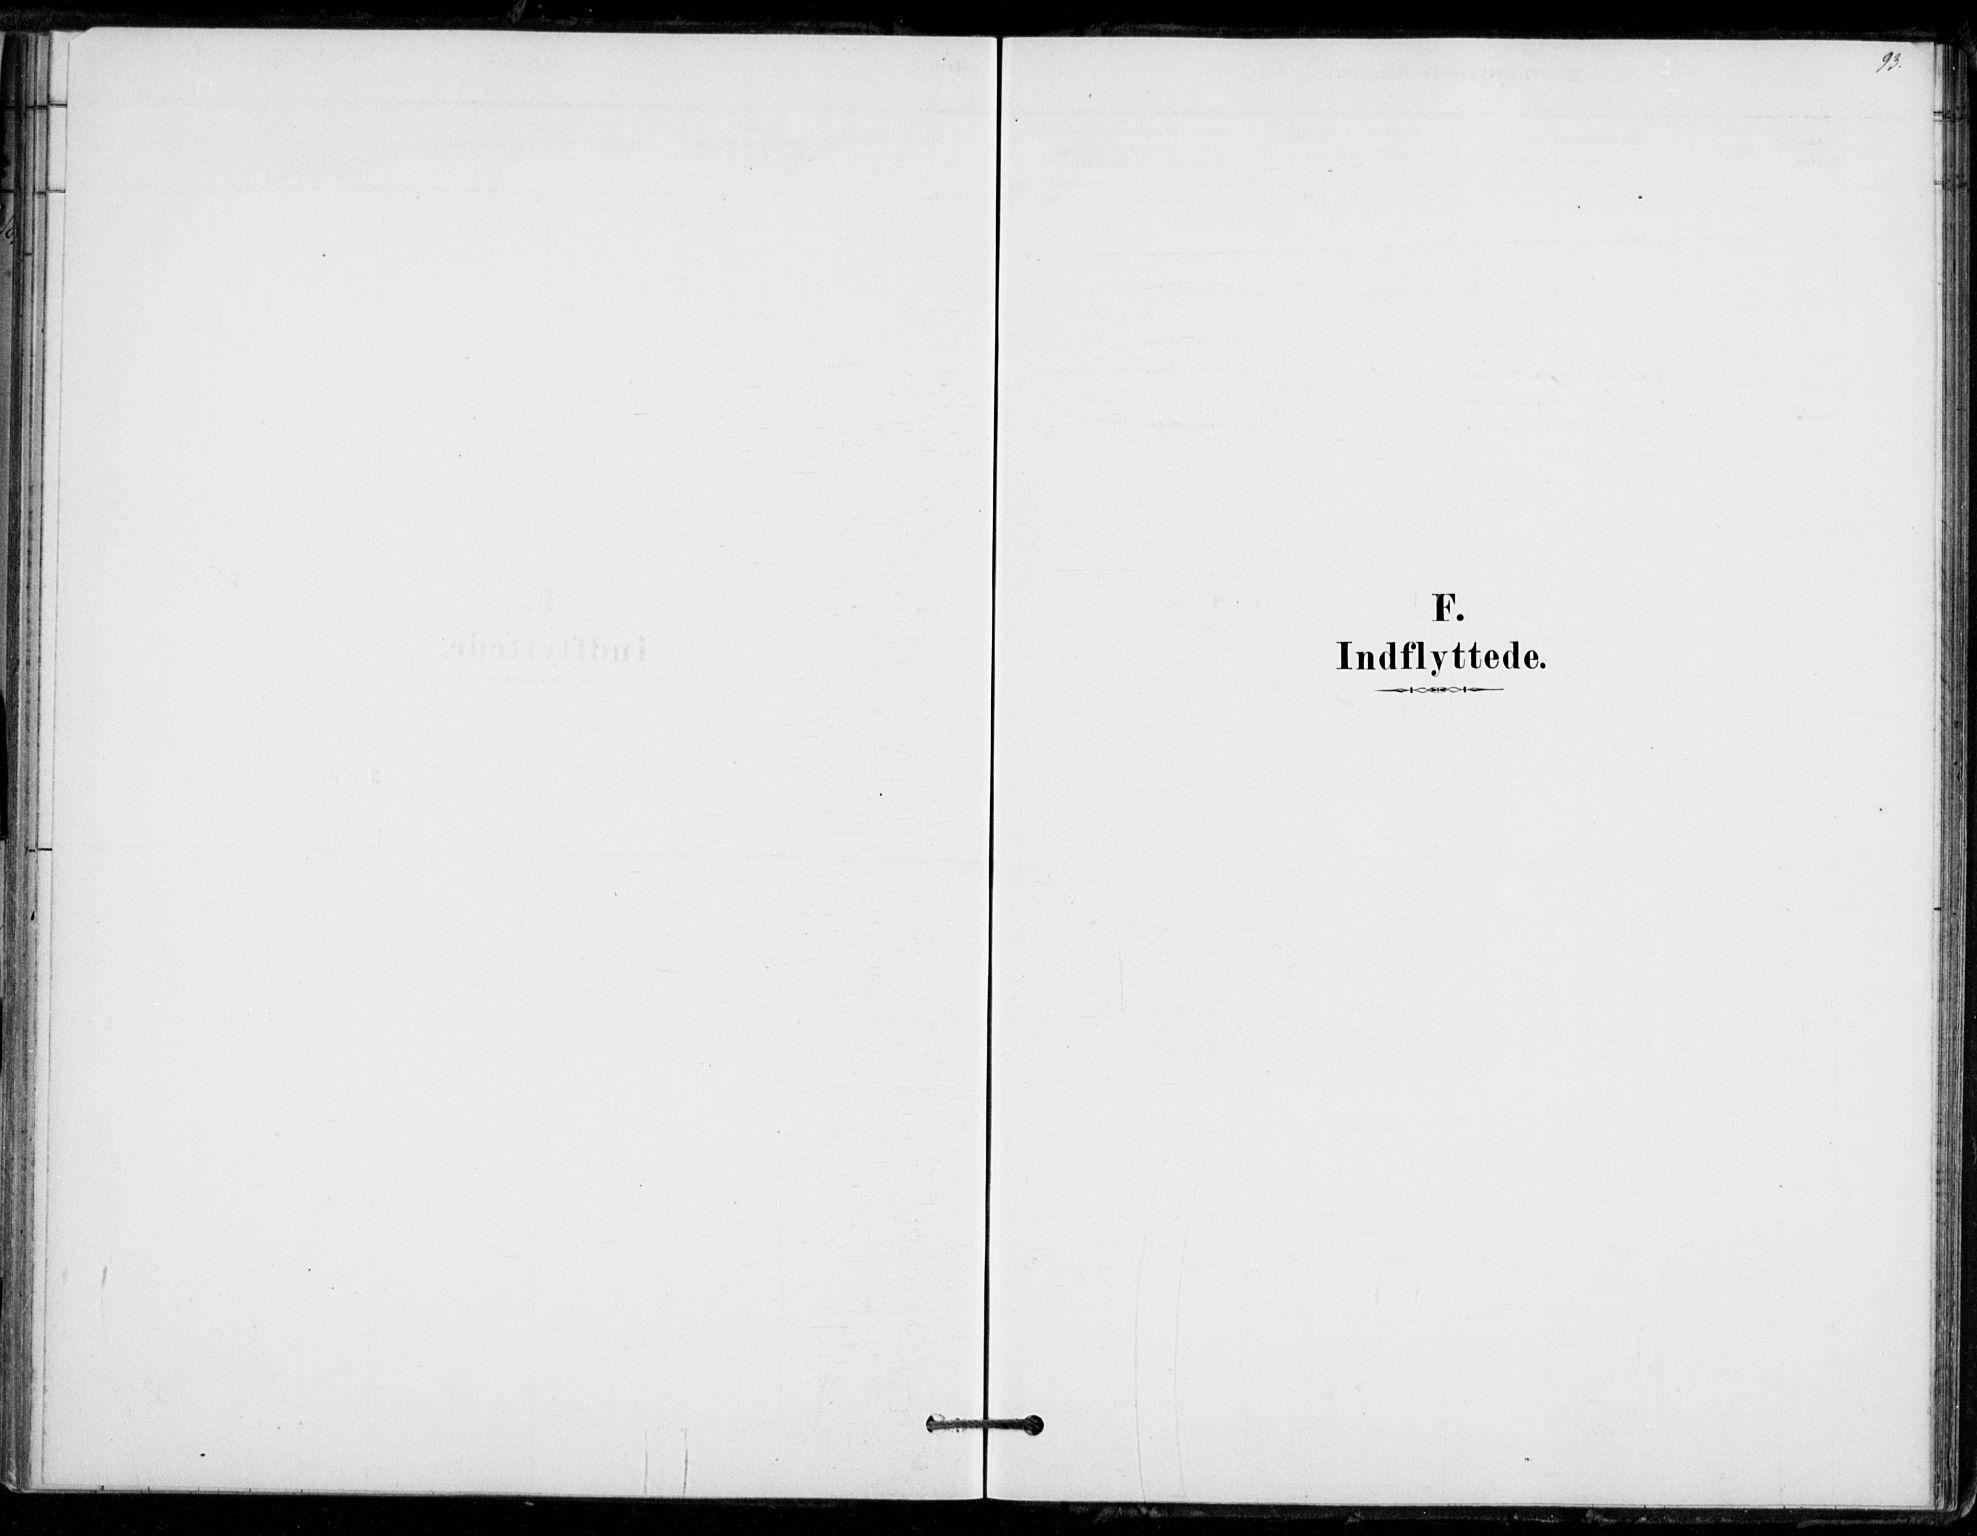 SAKO, Hof kirkebøker, F/Fb/L0001: Ministerialbok nr. II 1, 1878-1907, s. 93